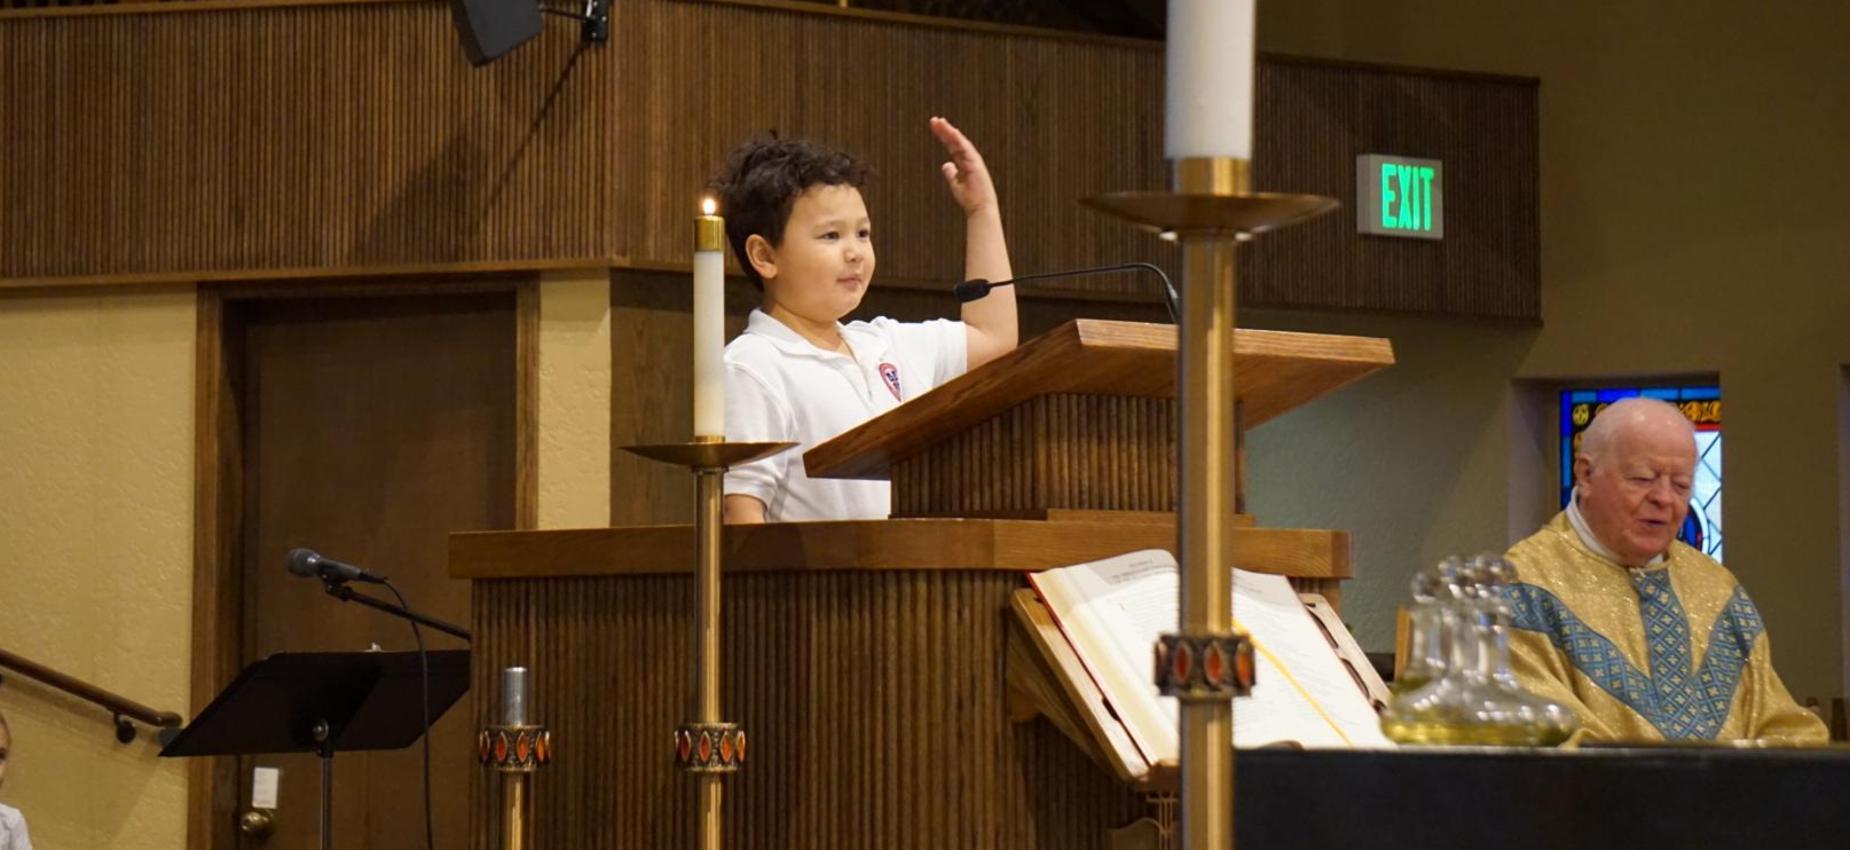 Student Leading mass